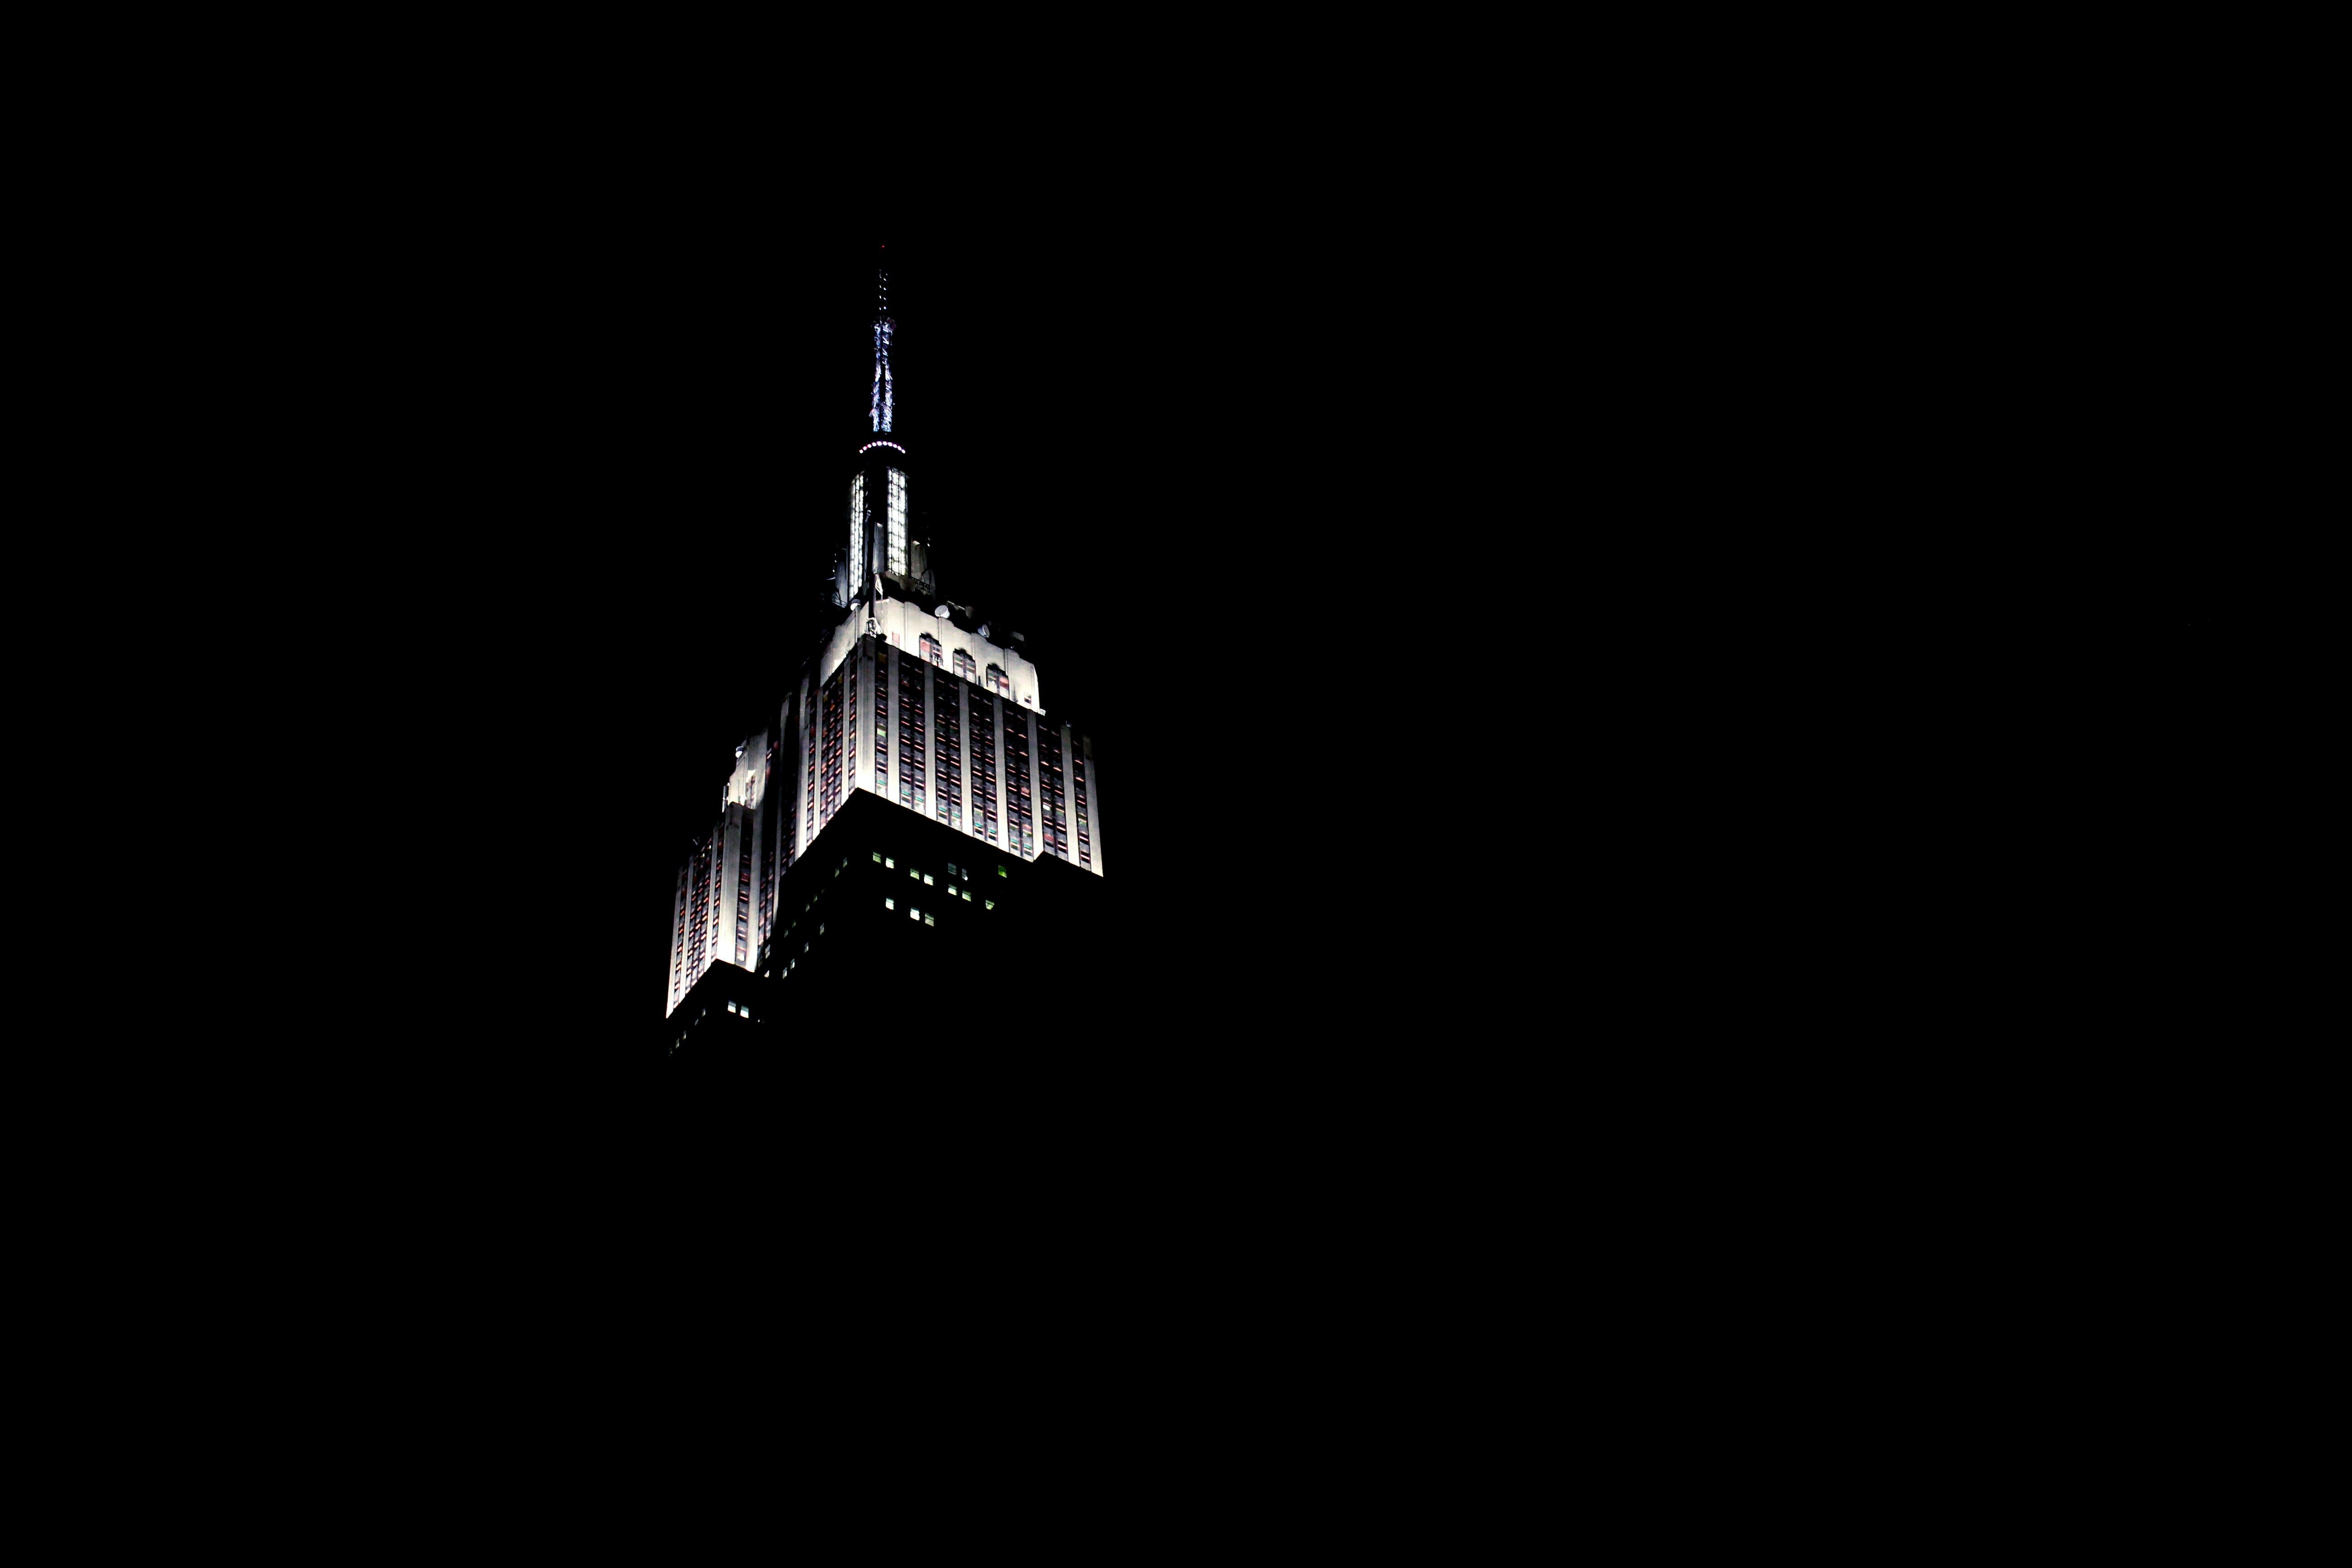 Kostenloses Stock Foto zu empire state building, new york